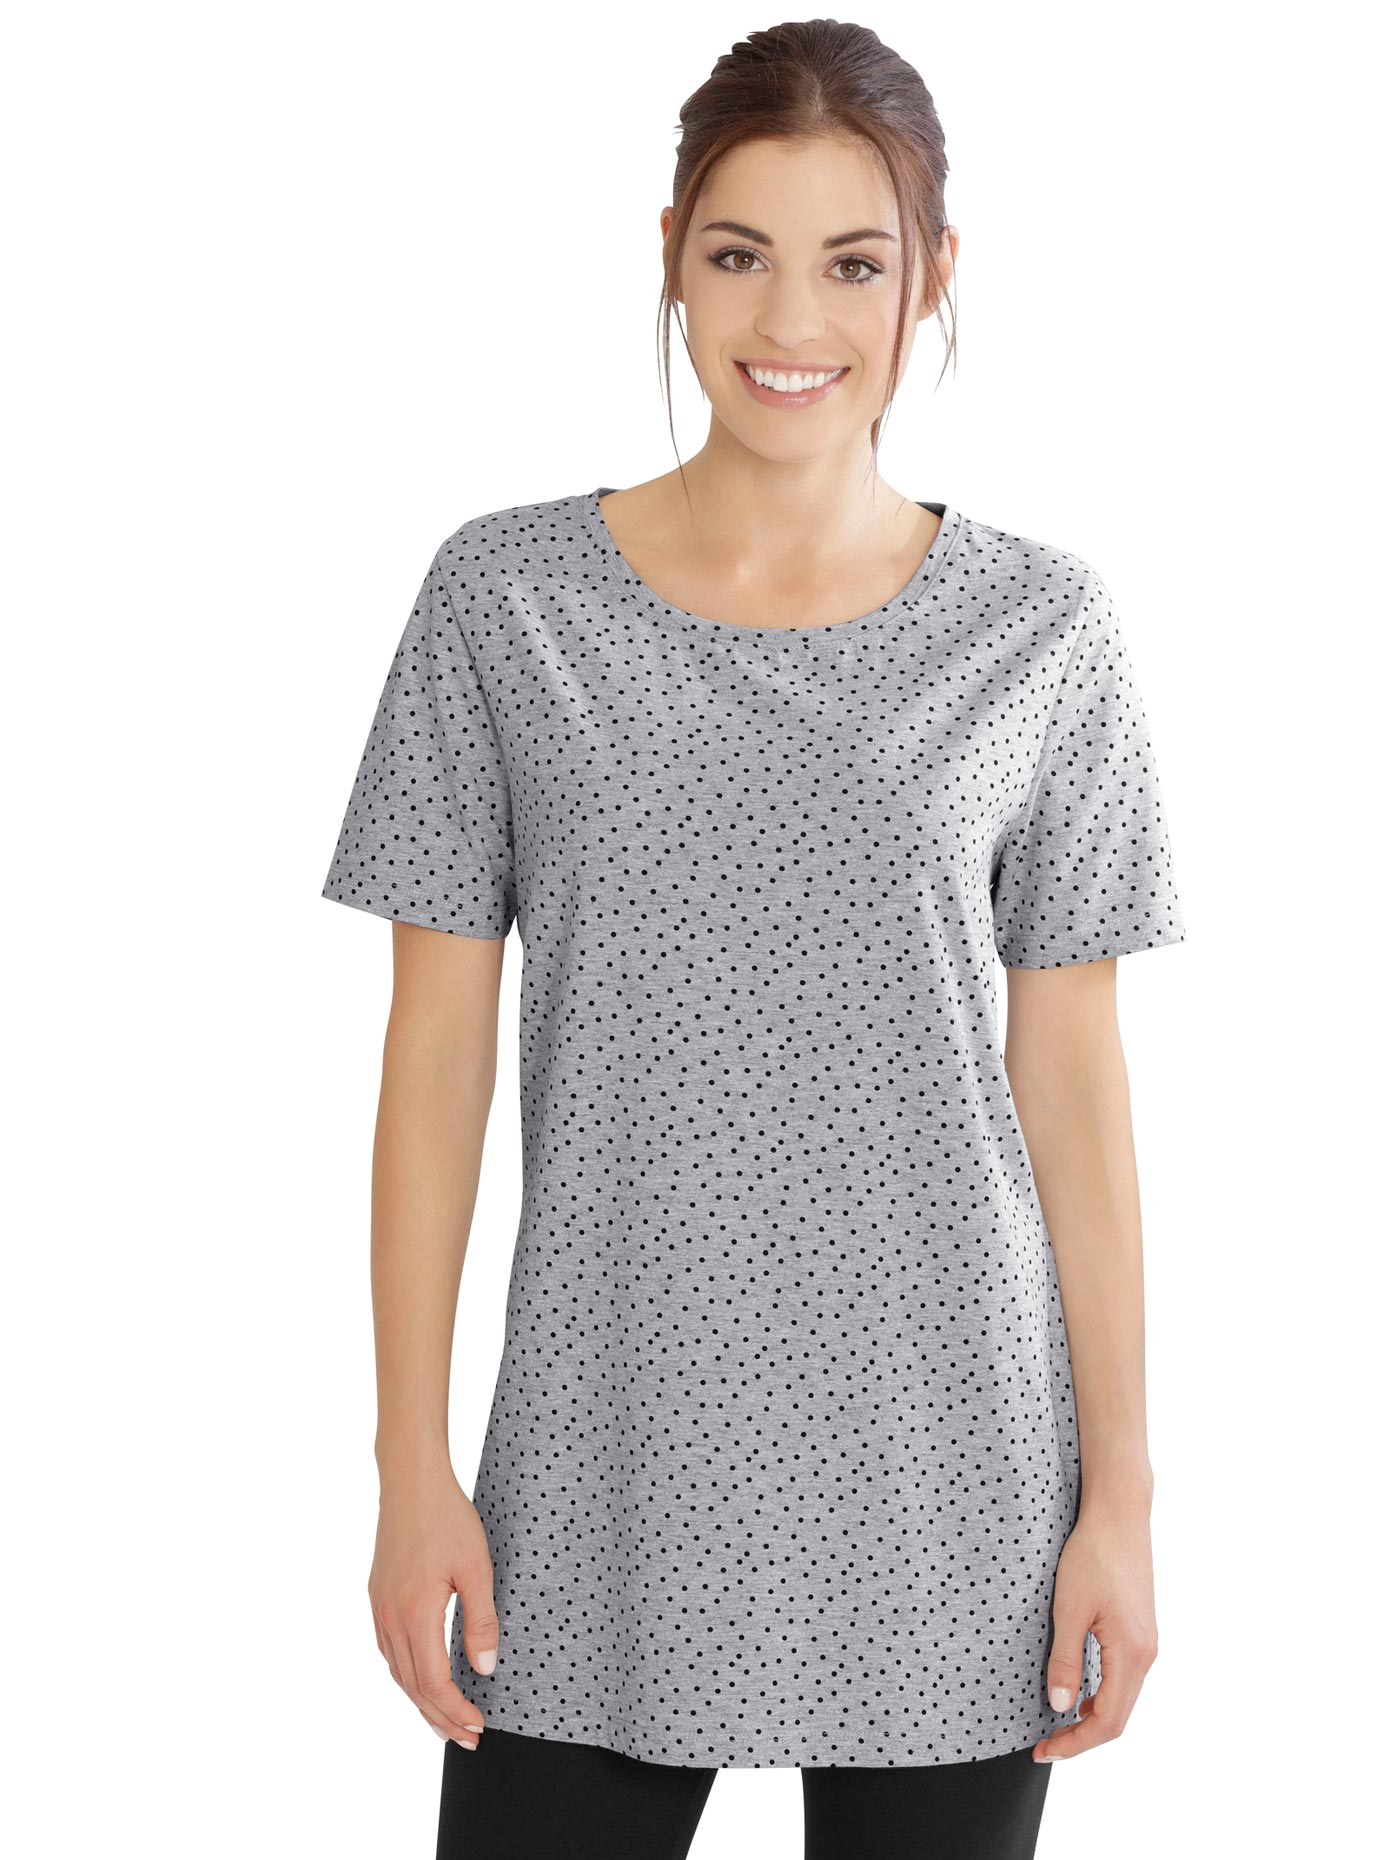 Longshirt | Bekleidung > Shirts > Longshirts | Grau